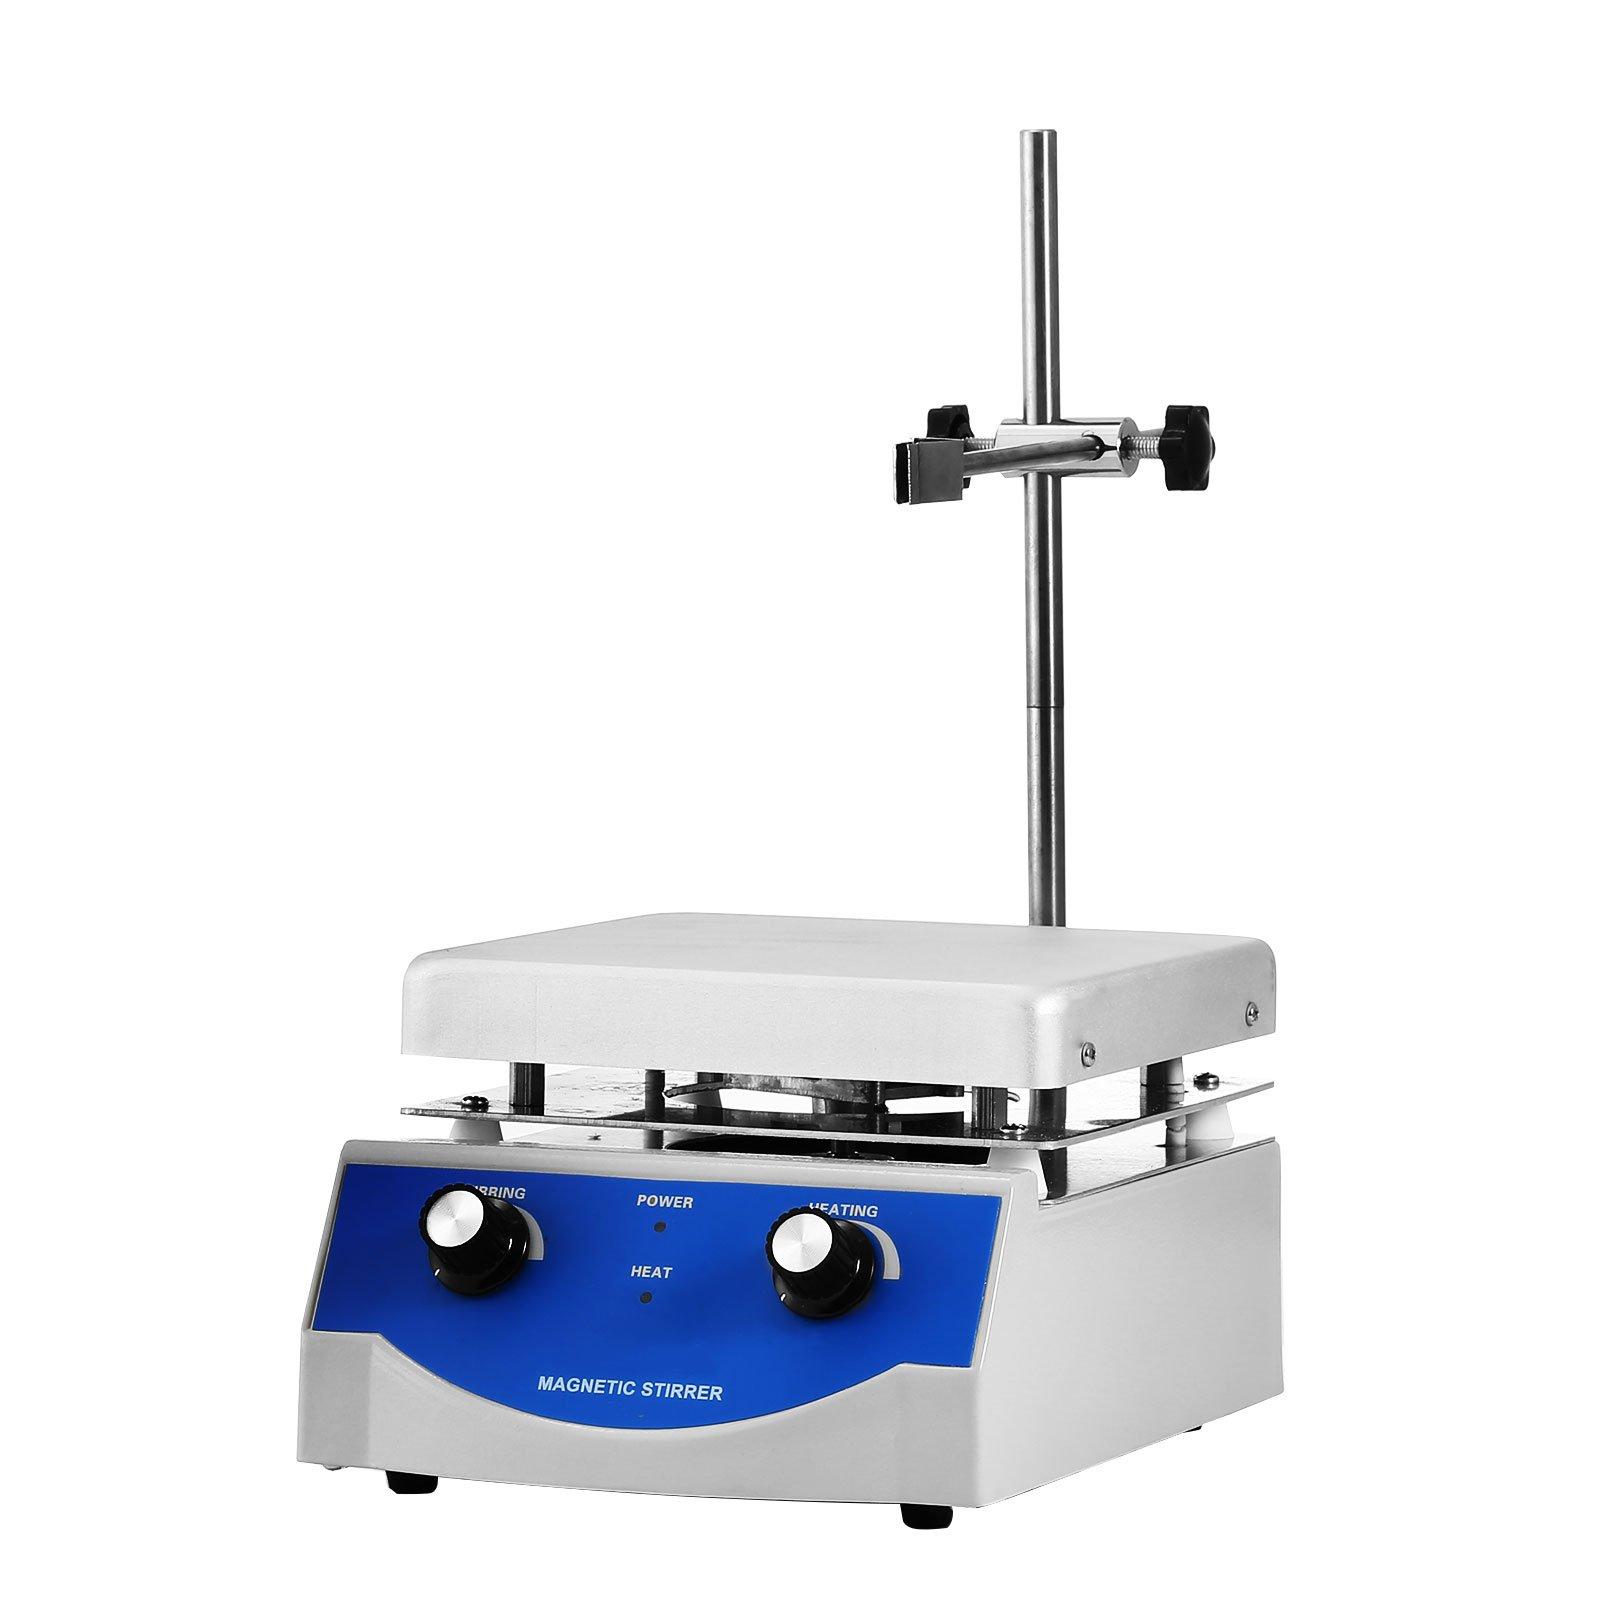 Happybuy Magnetic Stirrer 6.7 X 6.7Inch SH-3 Magnetic Mixer 500W 3000ml Magnetic Stirrer Hot Plate 1600 RPM Magnetic Stirrer with Free Stirring Rod